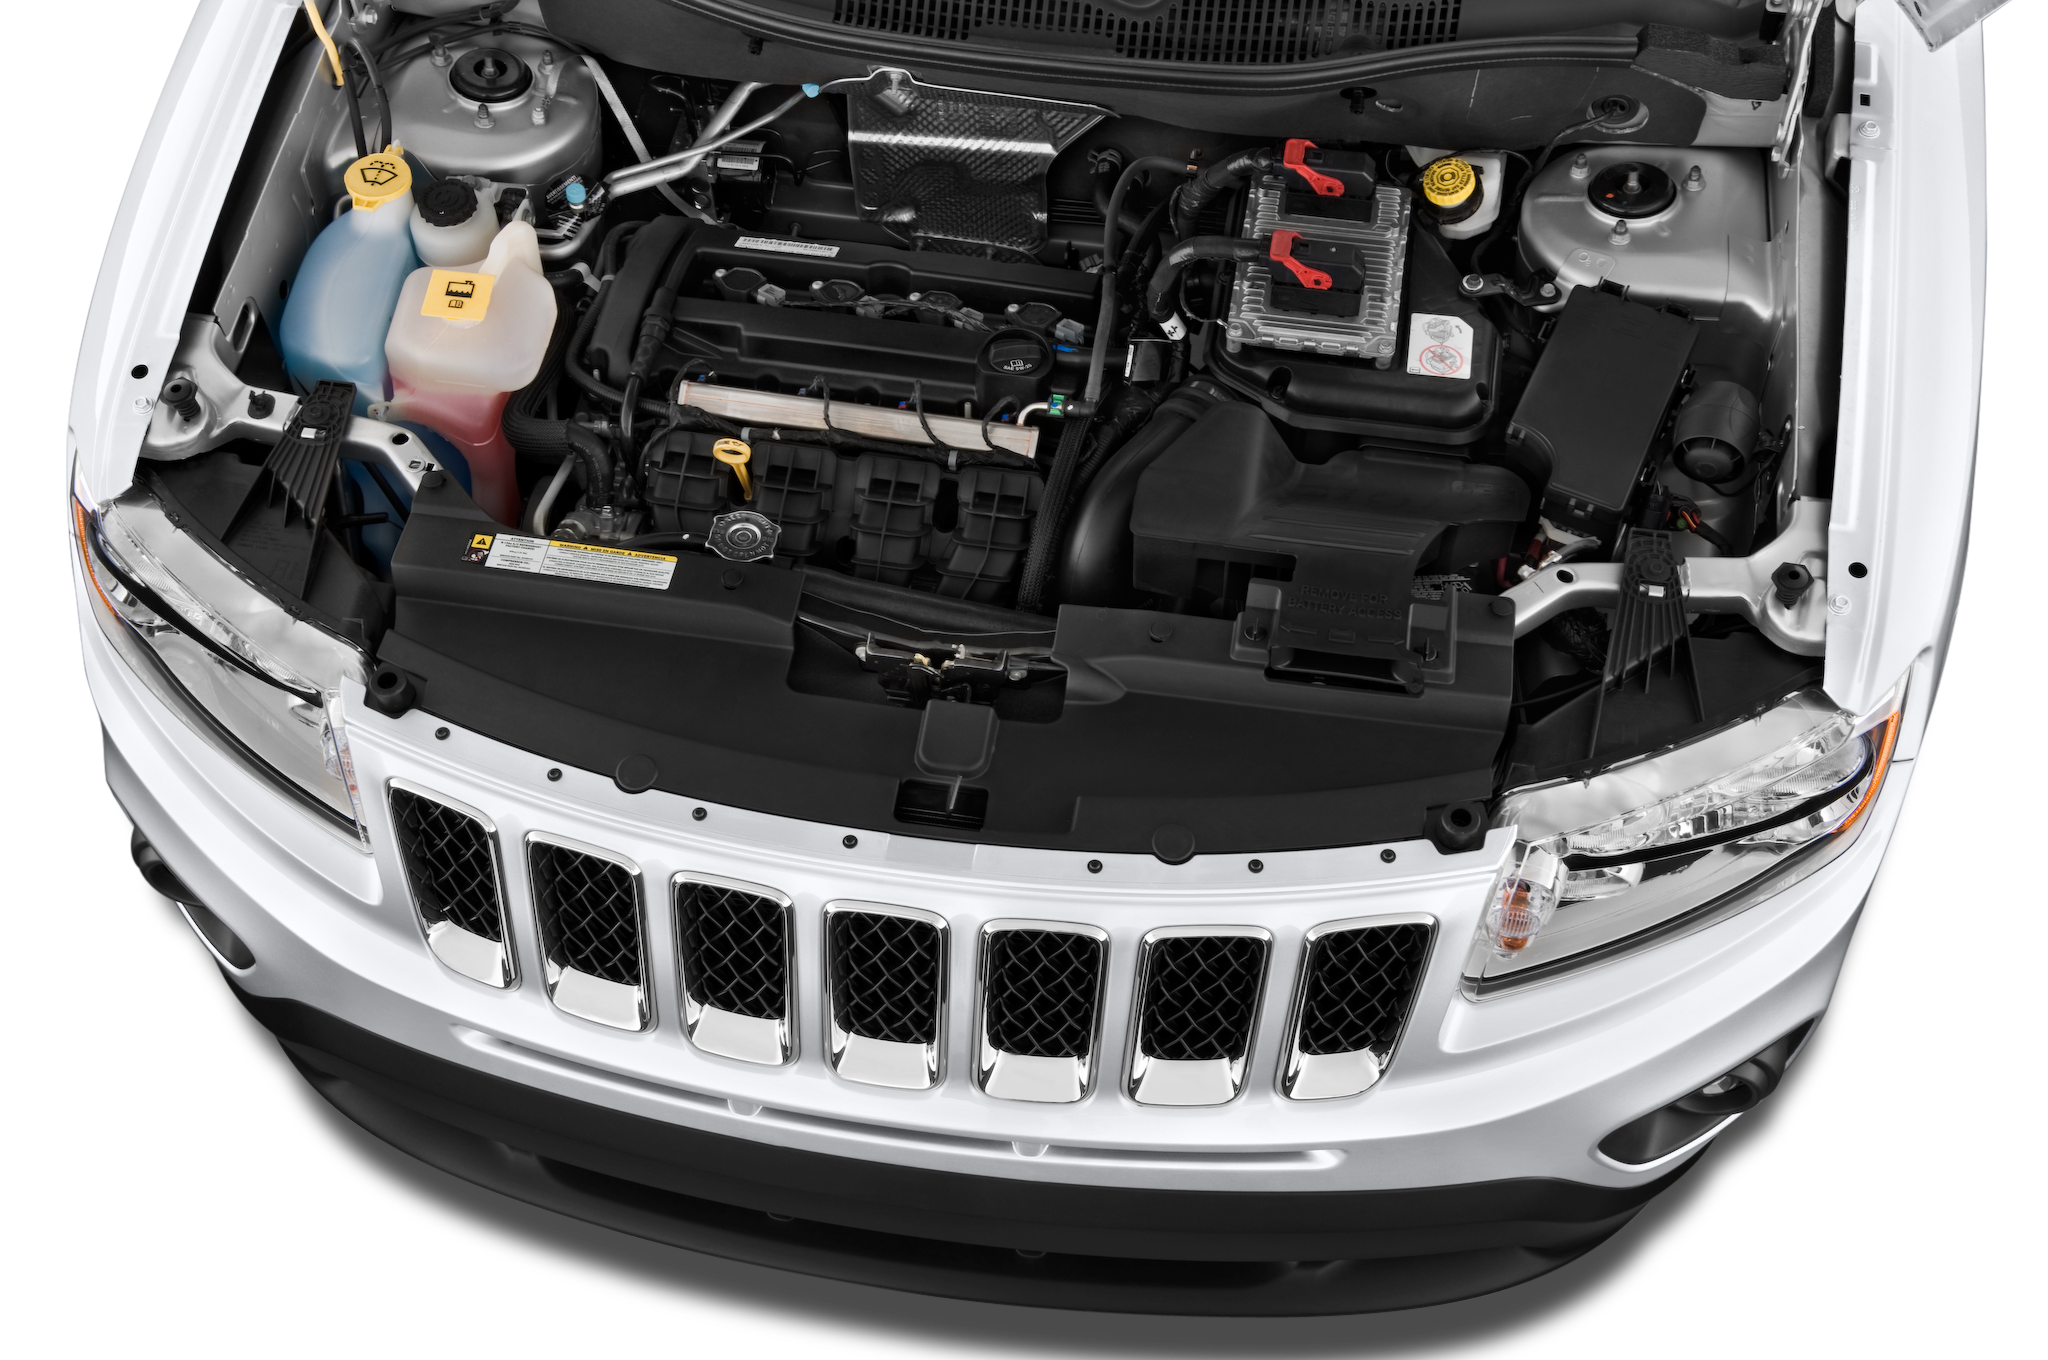 Jeep Compass Sport Suv Engine on 1 6 Fiat Engine Parts Diagram